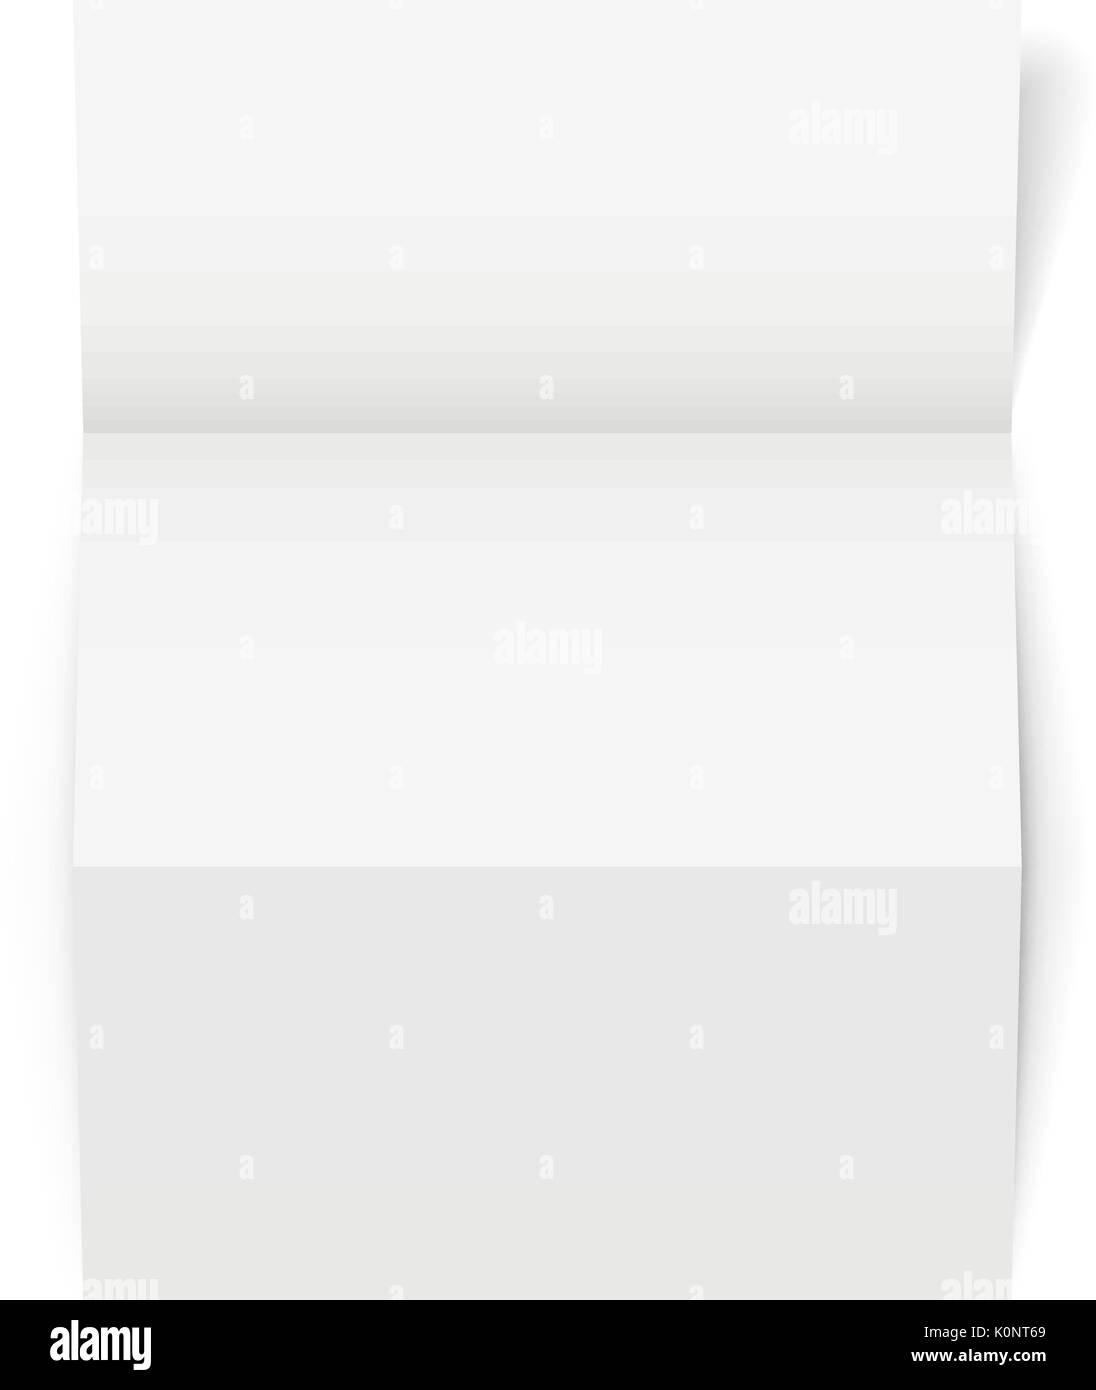 Tri Fold Card Stock Photos & Tri Fold Card Stock Images - Alamy